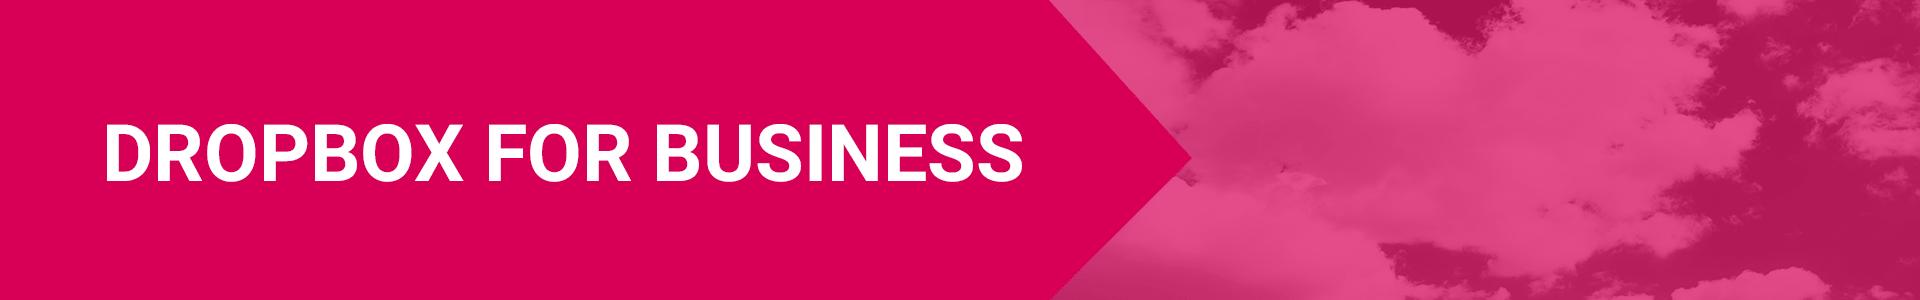 Dropbox for business header